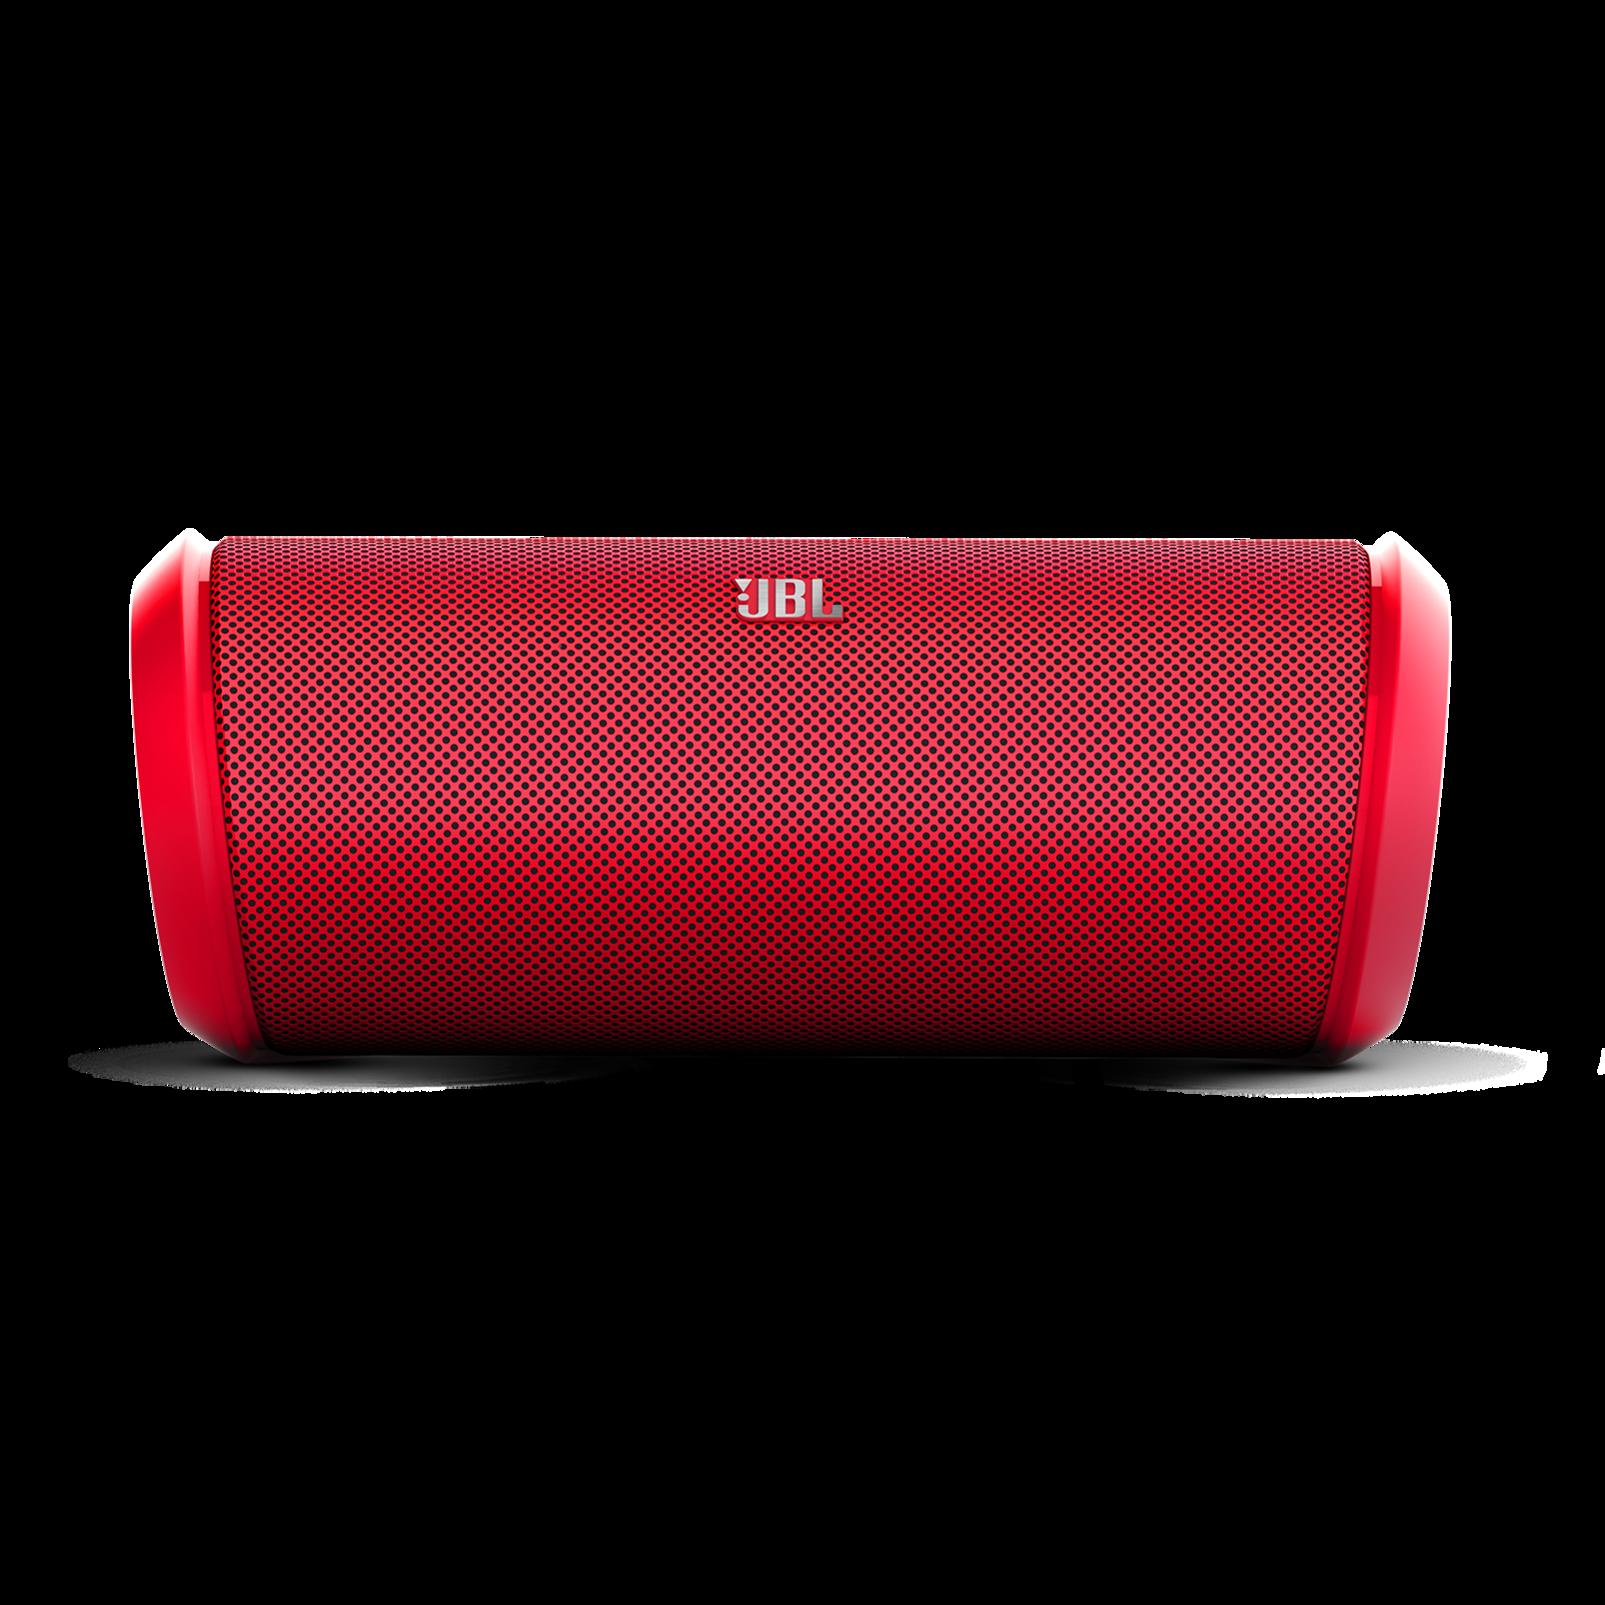 Jbl Flip 2 Bluetooth Speaker Portable Stereo Merah Daftar Harga